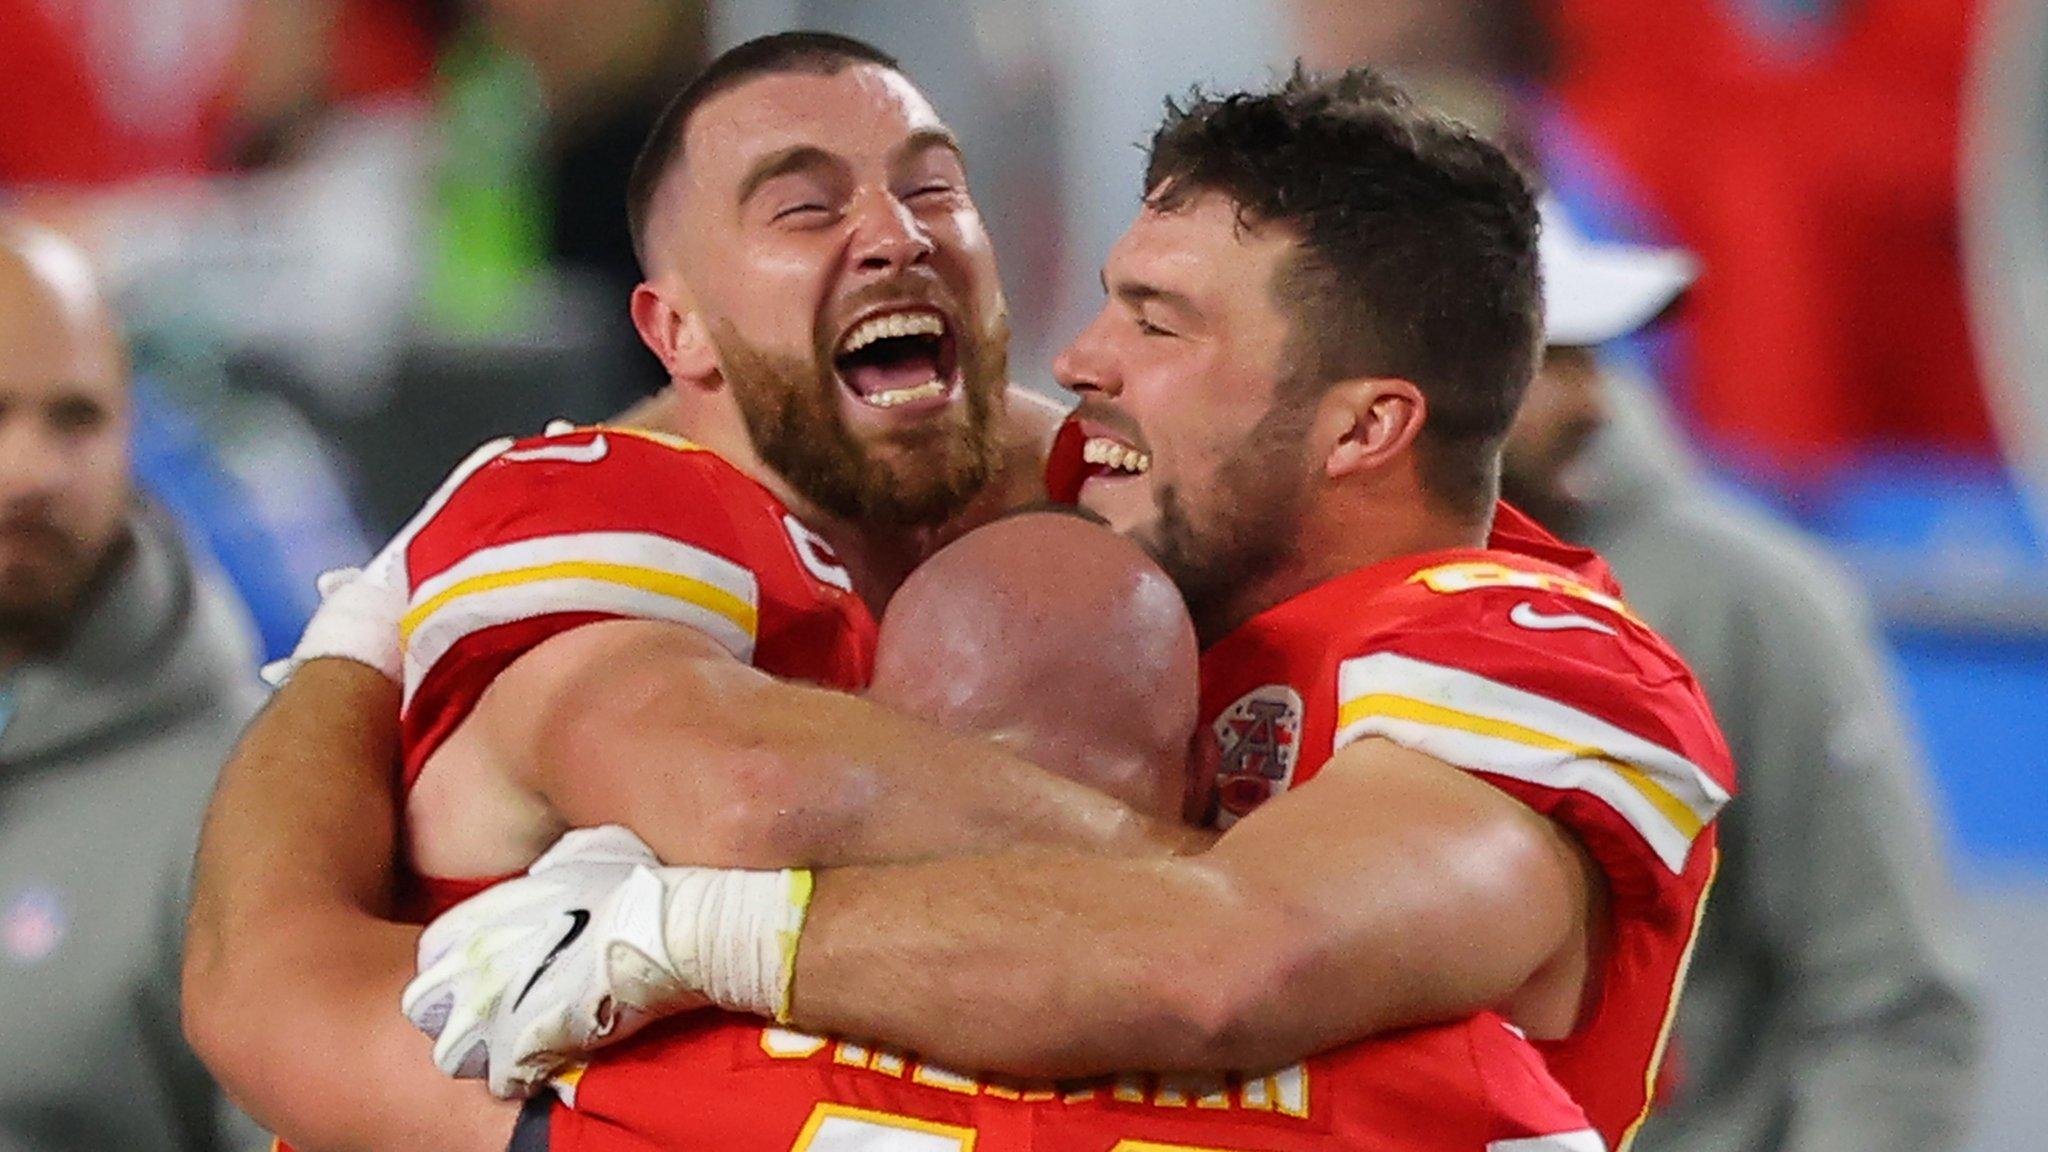 BBC Sport - Super Bowl 2020: Kansas City Chiefs pull off a sensational comeback to beat San Francisco 49ers